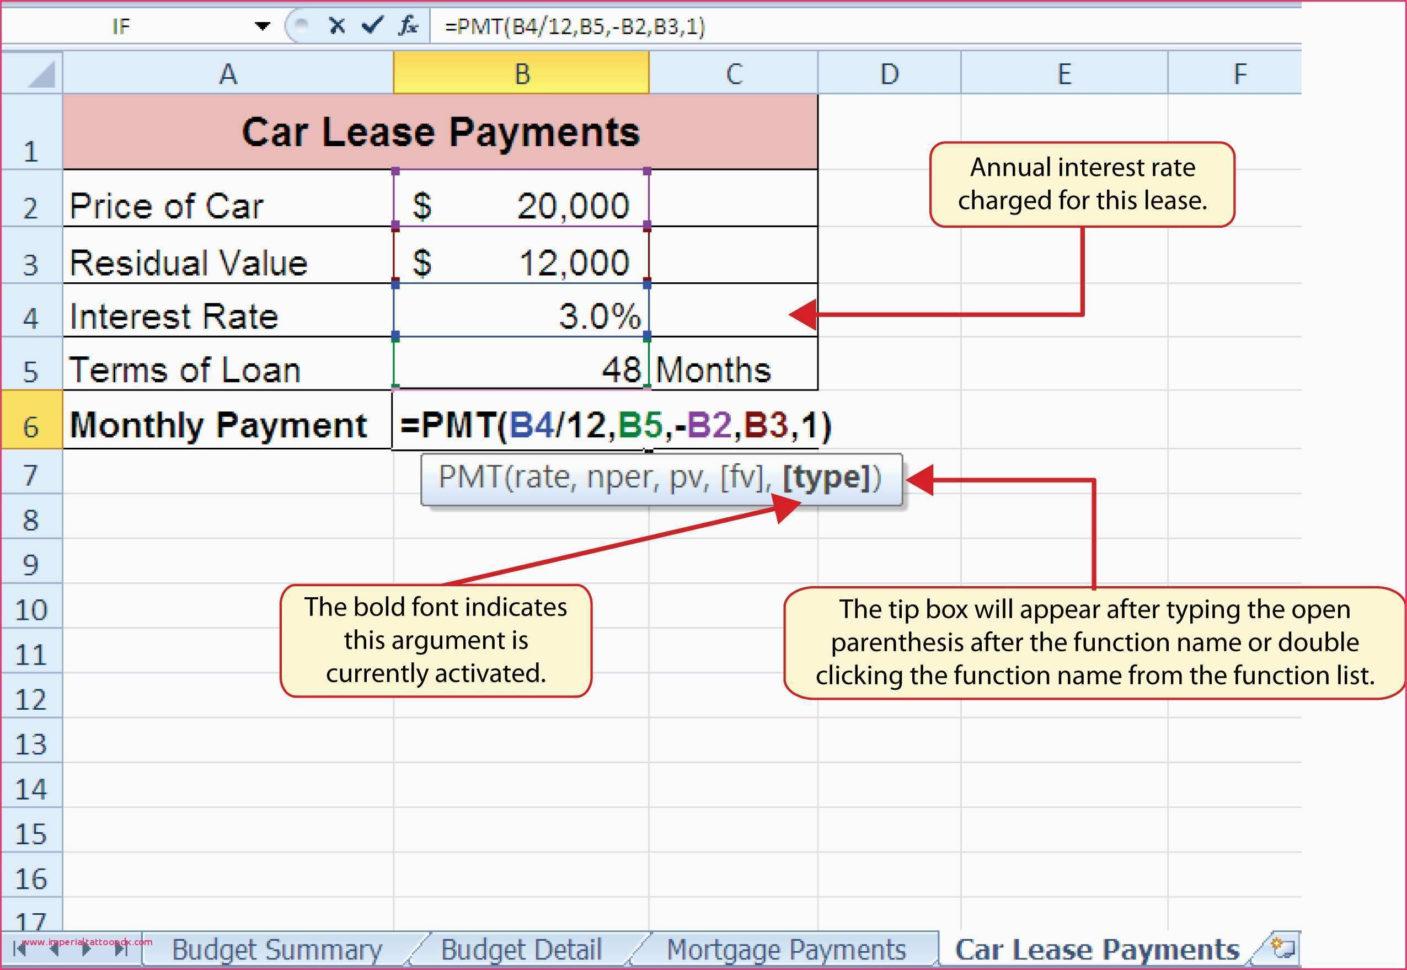 Car Buy Vs Lease Spreadsheet Regarding Auto Lease